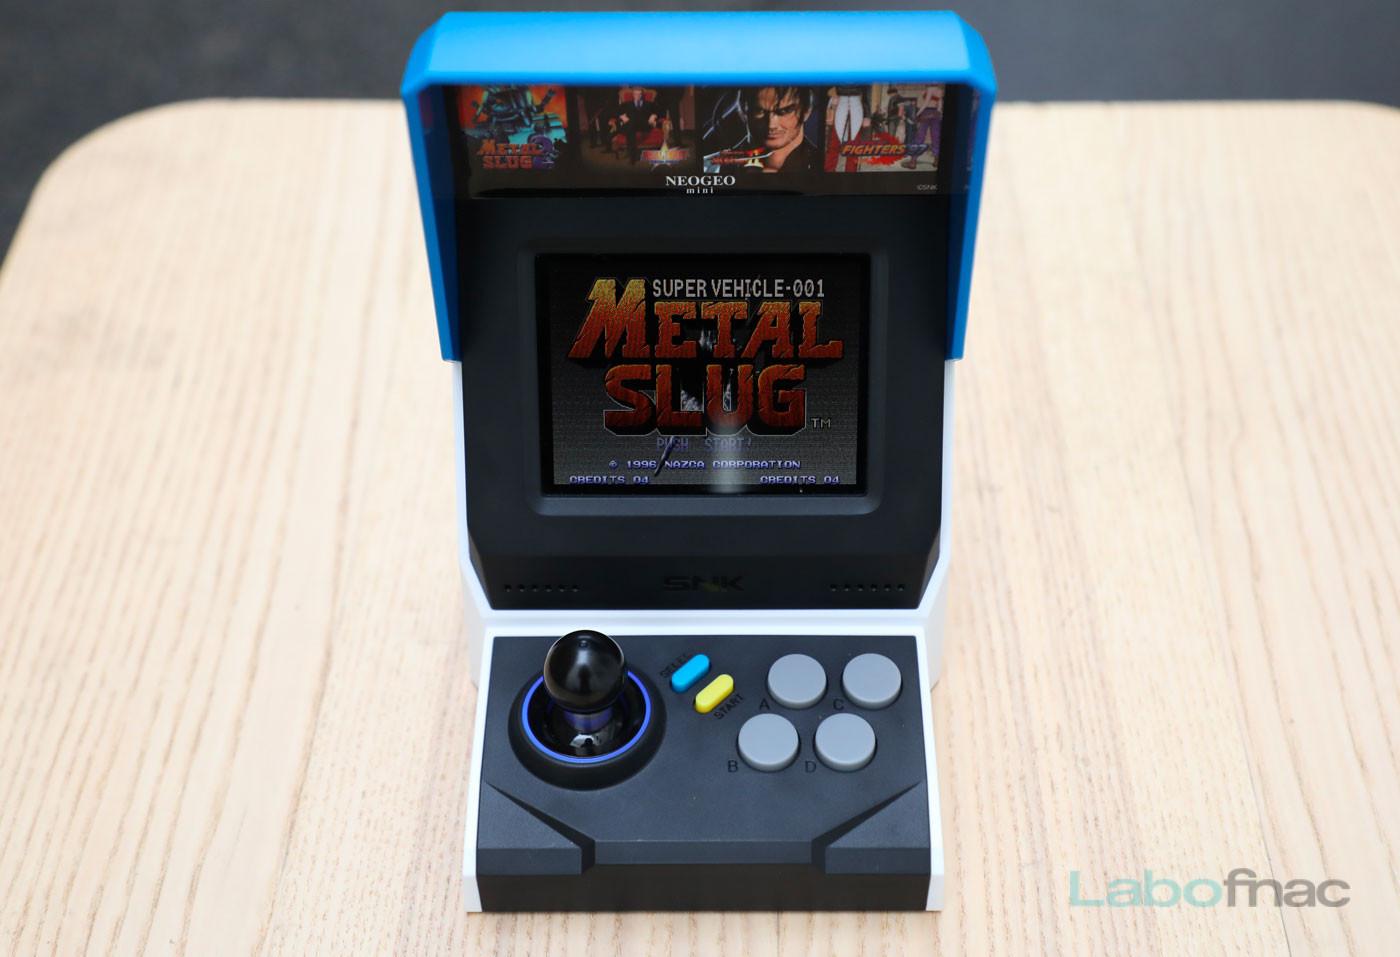 Prise en main de la Neo Geo Mini : une vraie petite borne d'arcade